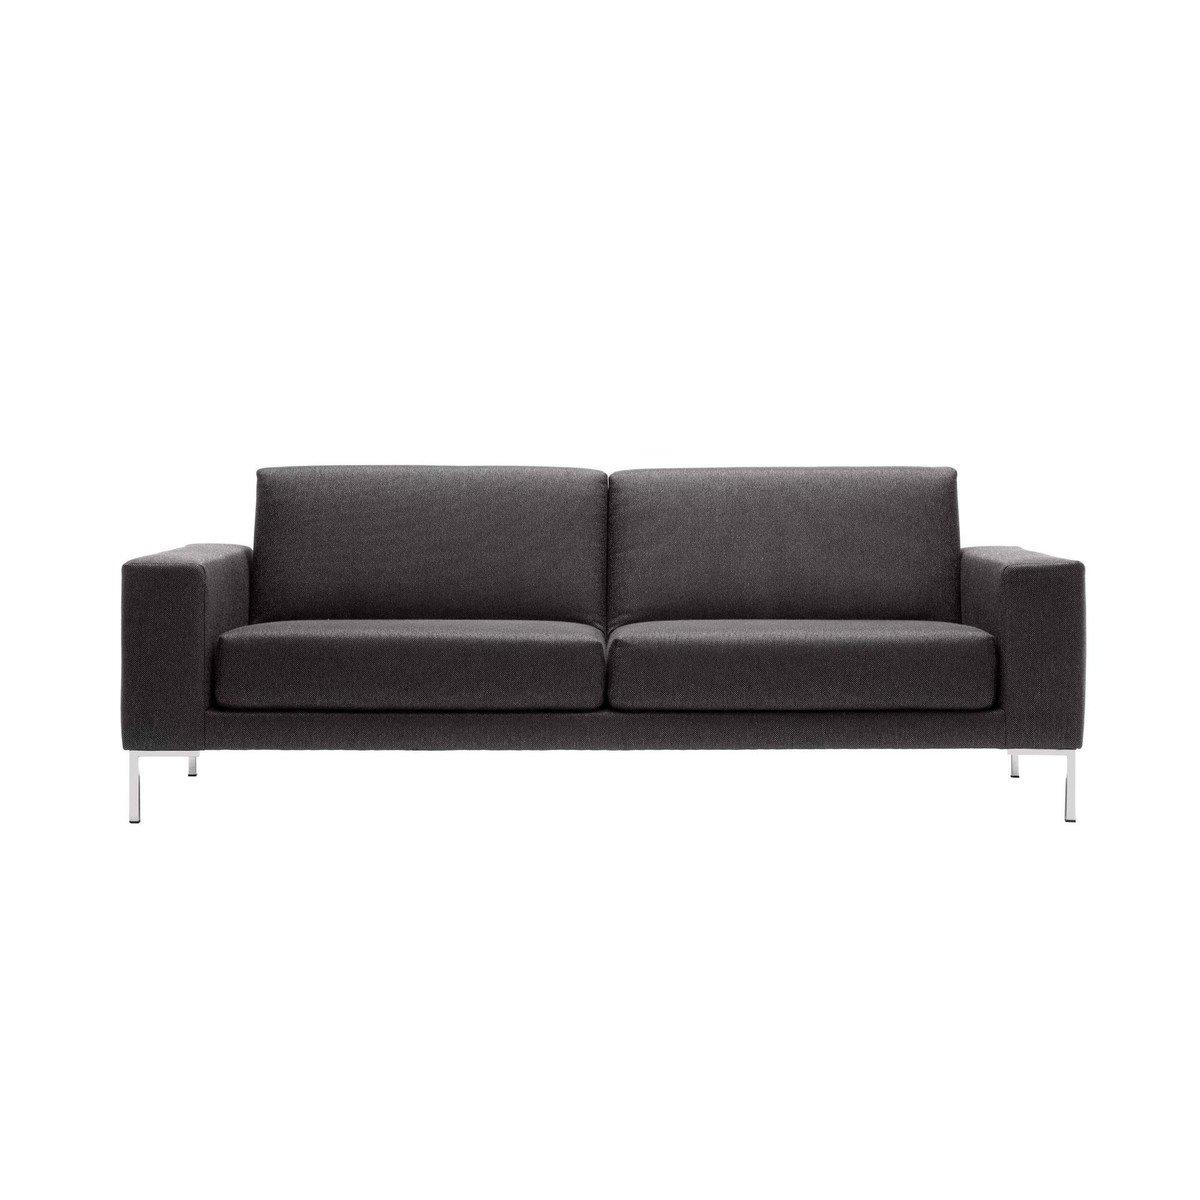 freistil 183 3-Seater Sofa   freistil Rolf Benz   AmbienteDirect.com